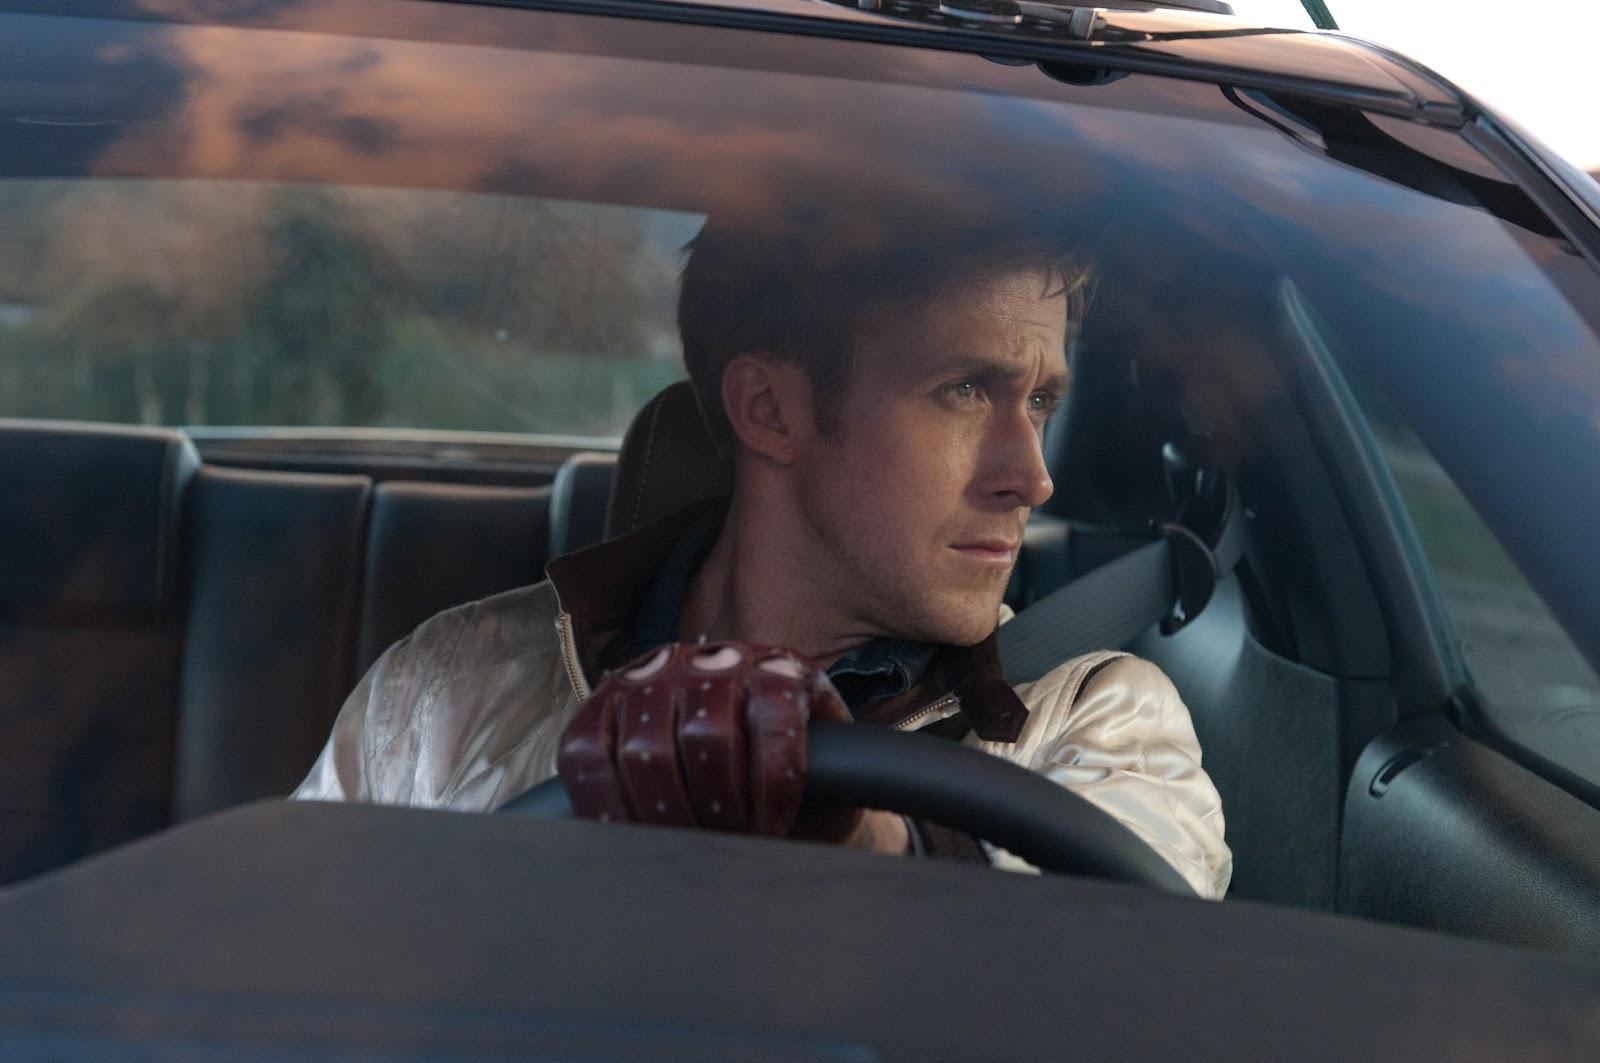 http://4.bp.blogspot.com/-wvzwDJVm4DQ/UD5wZEKo7II/AAAAAAAAAMo/tqpiDtWcw34/s1600/Ryan-Gosling-Drive-movie-image-8.jpg